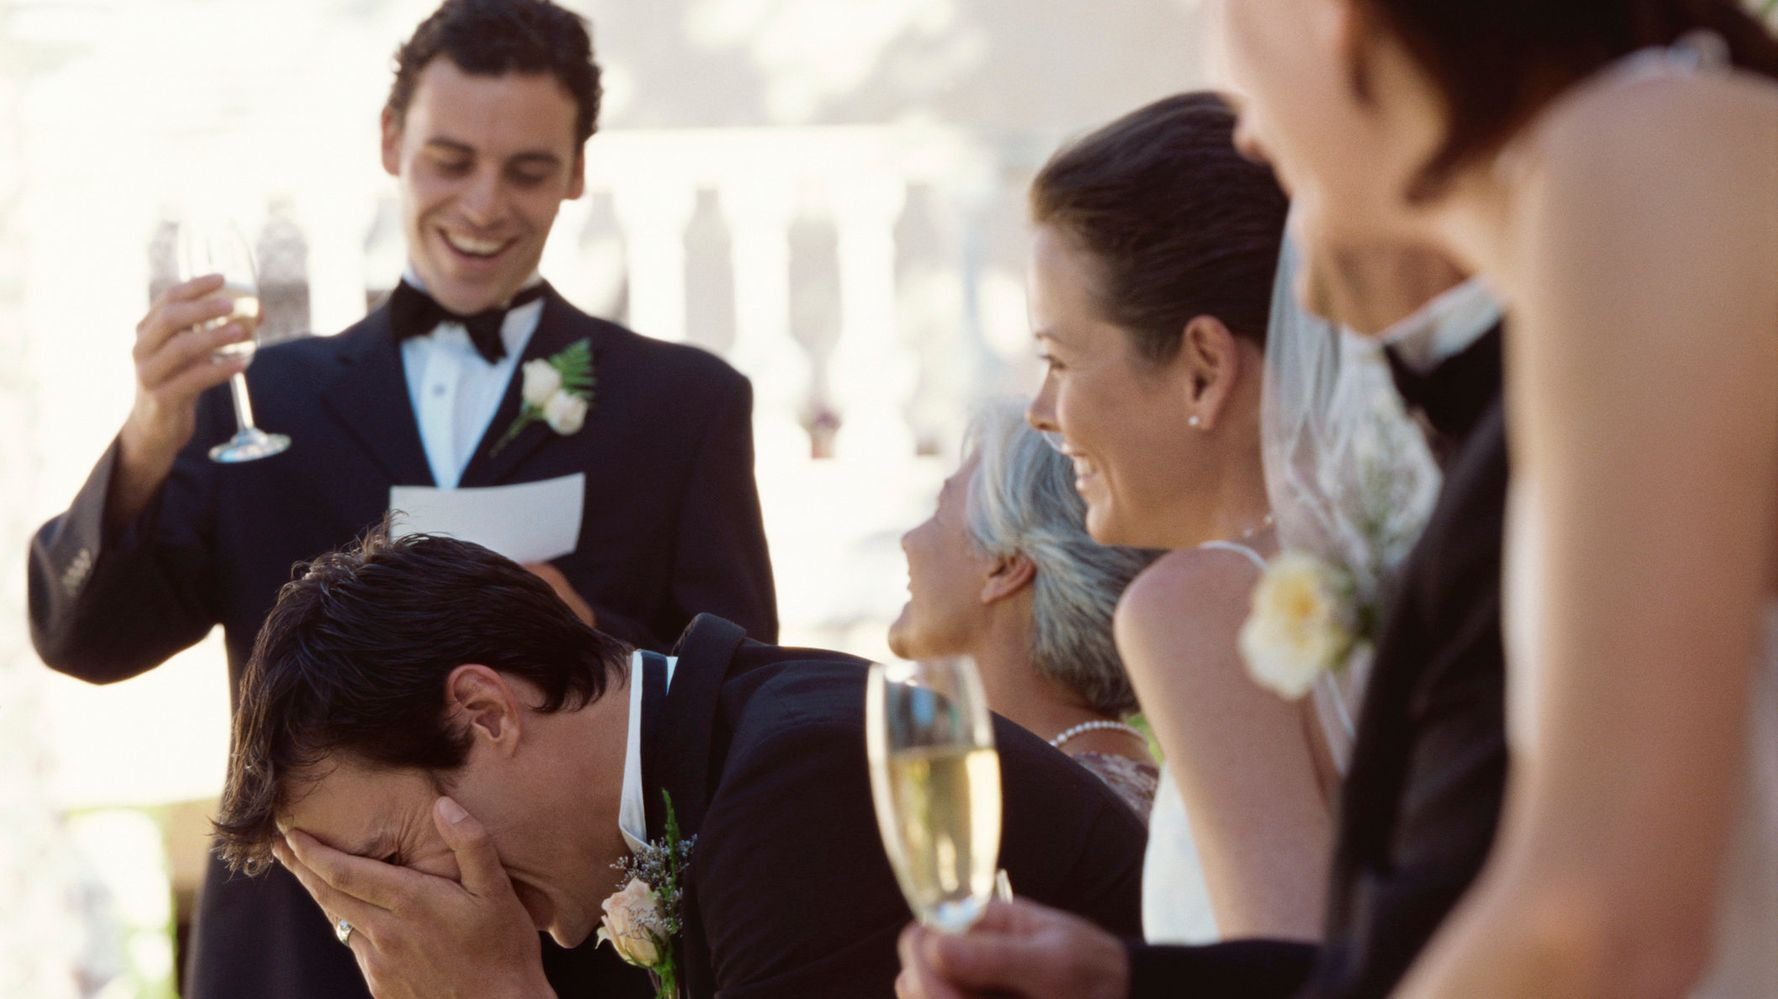 How To Write A Good Wedding Speech Even If You're Not A Writer